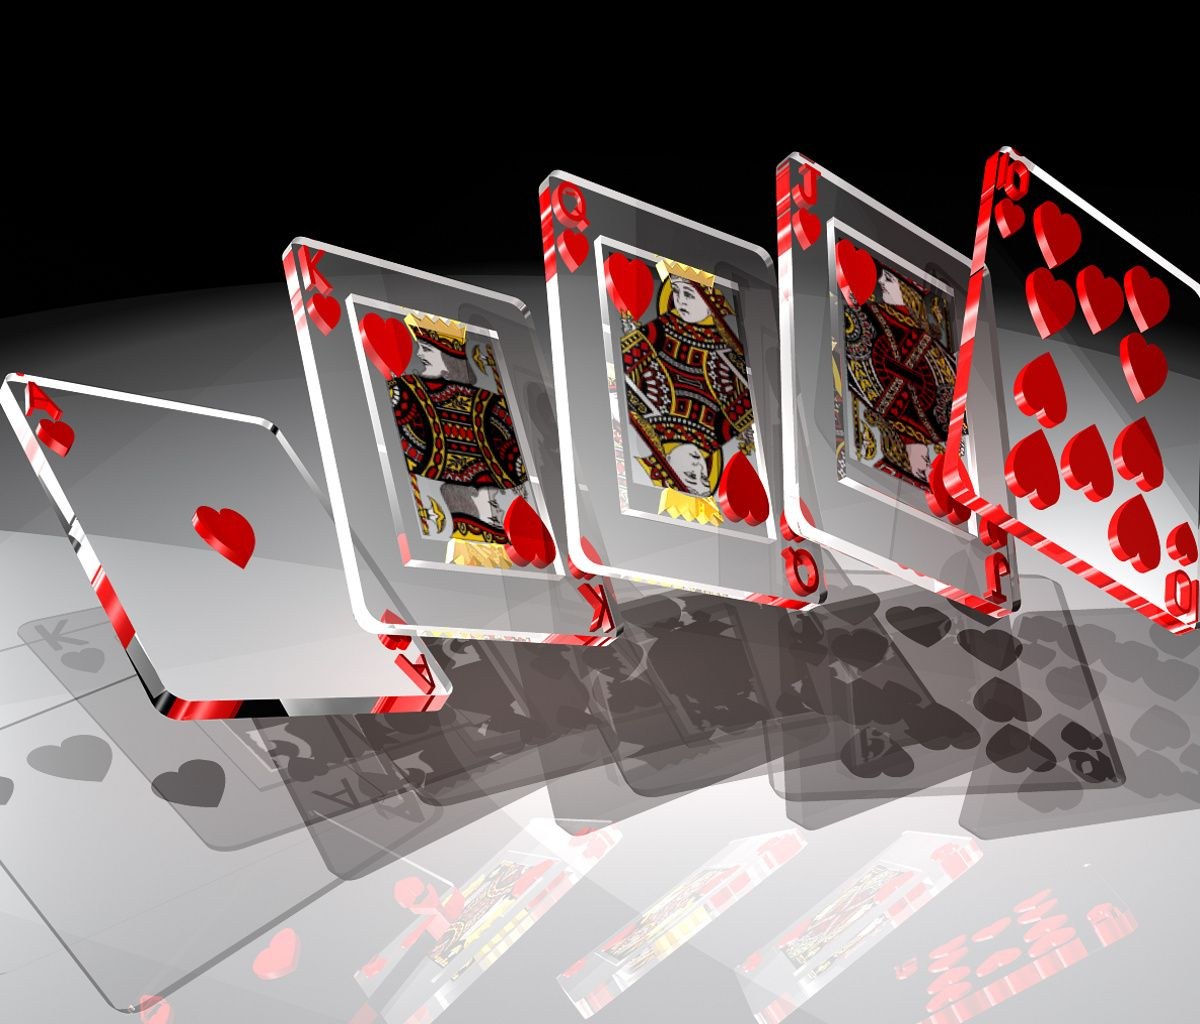 pinlisa morina on hd wall cloud | poker, mobile wallpaper, cards